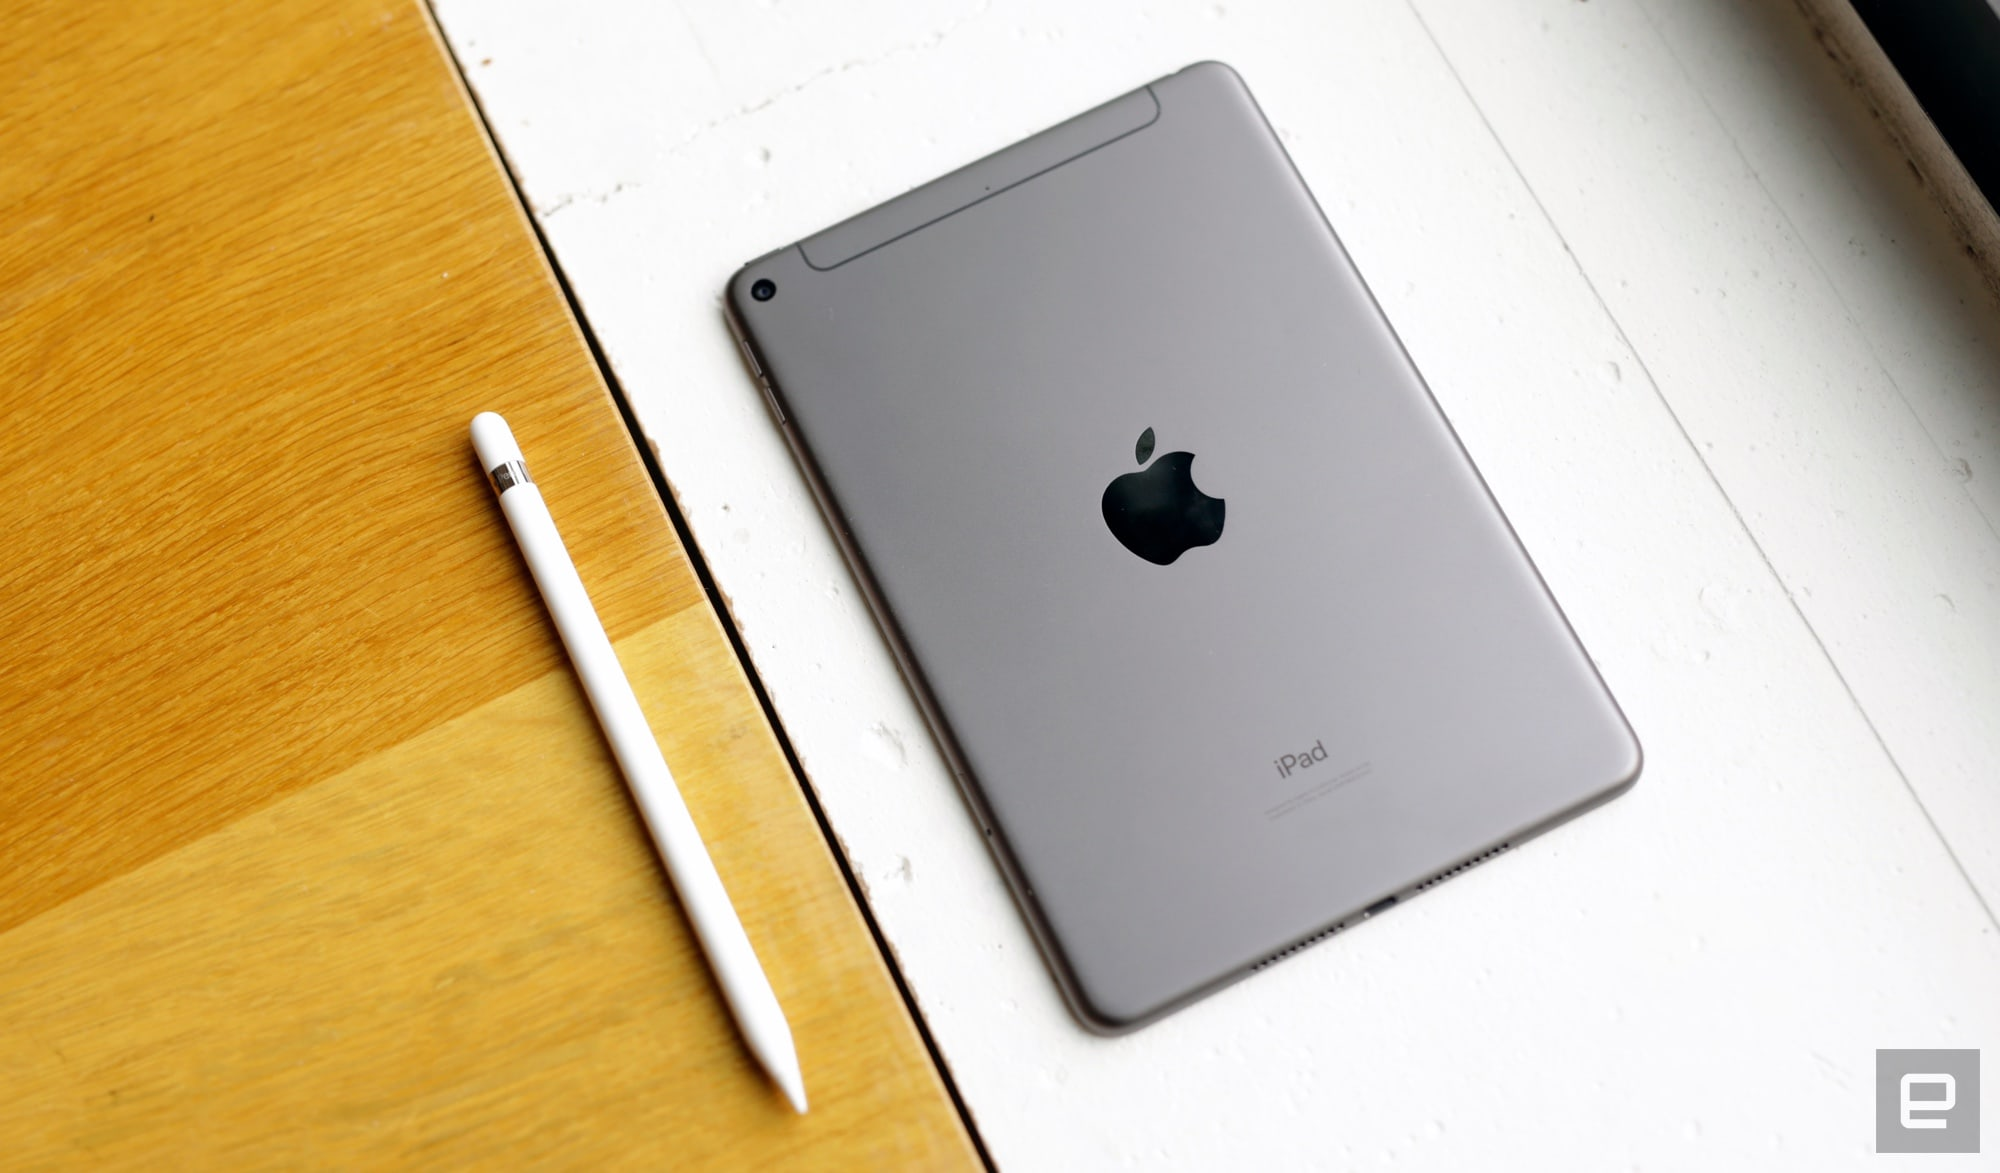 Apple iPad mini review (2019): Still the best small tablet